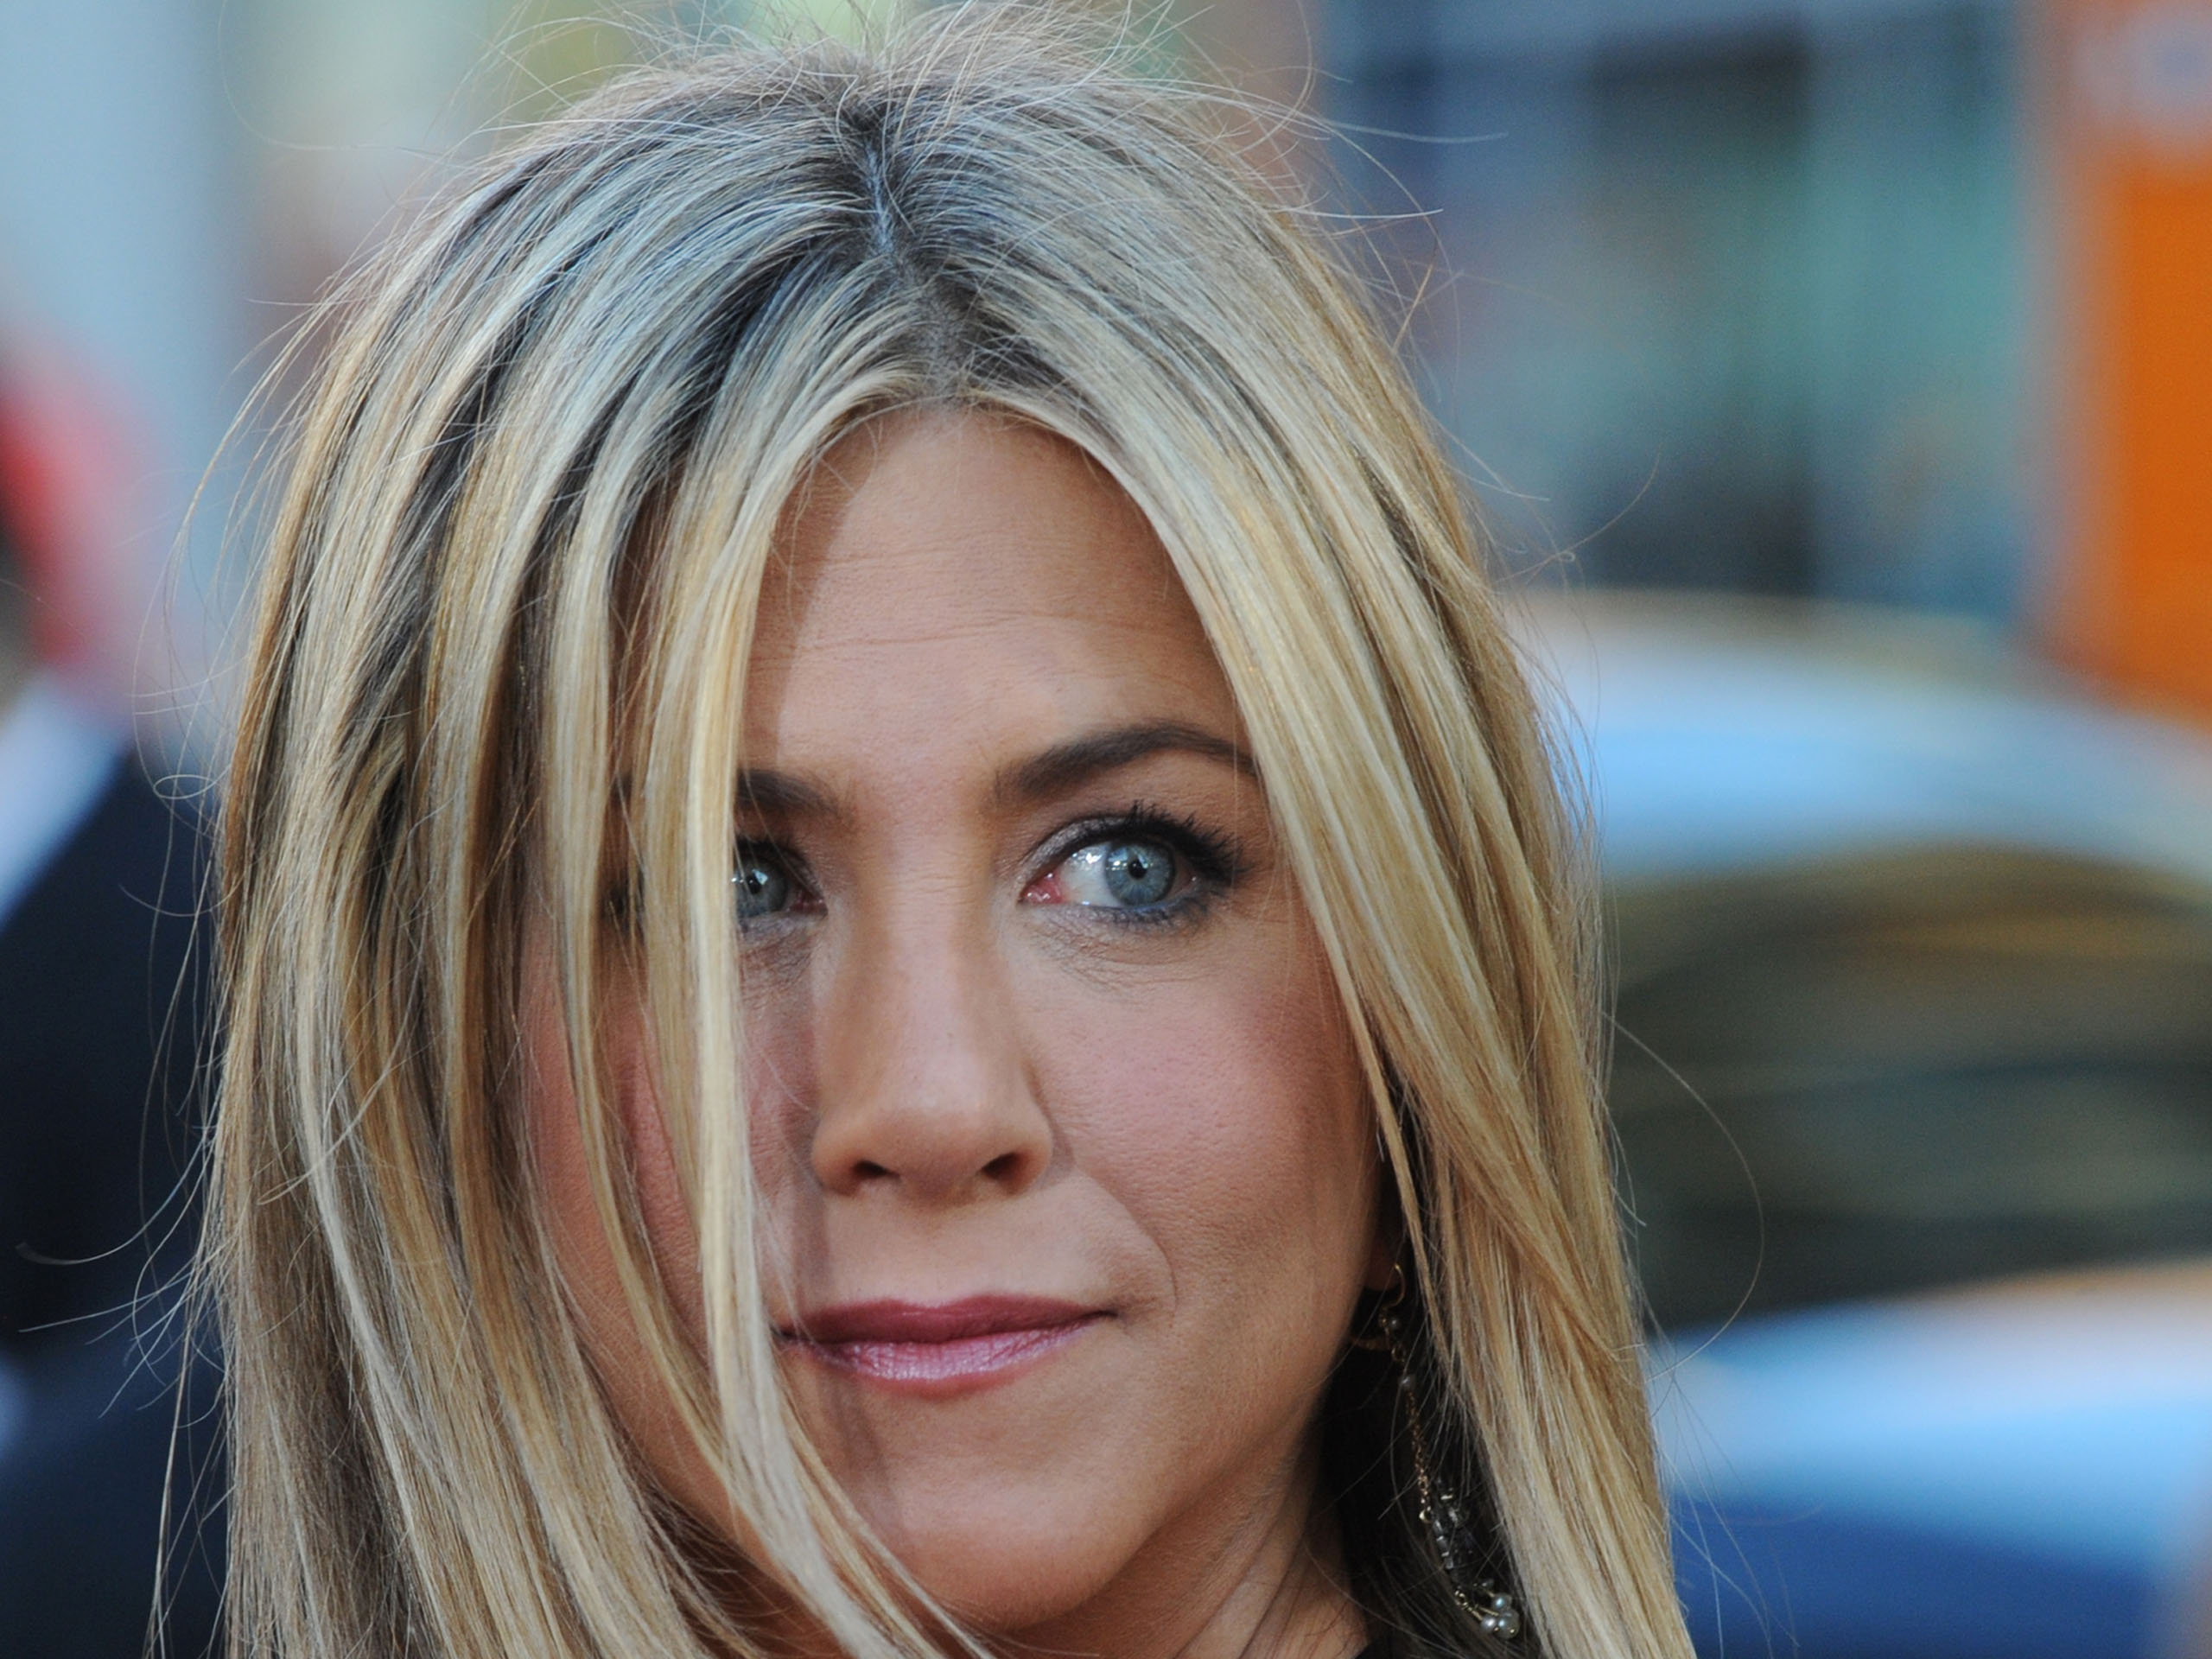 Hrithik Hd Wallpaper Jennifer Aniston Hd Wallpapers Popopics Com